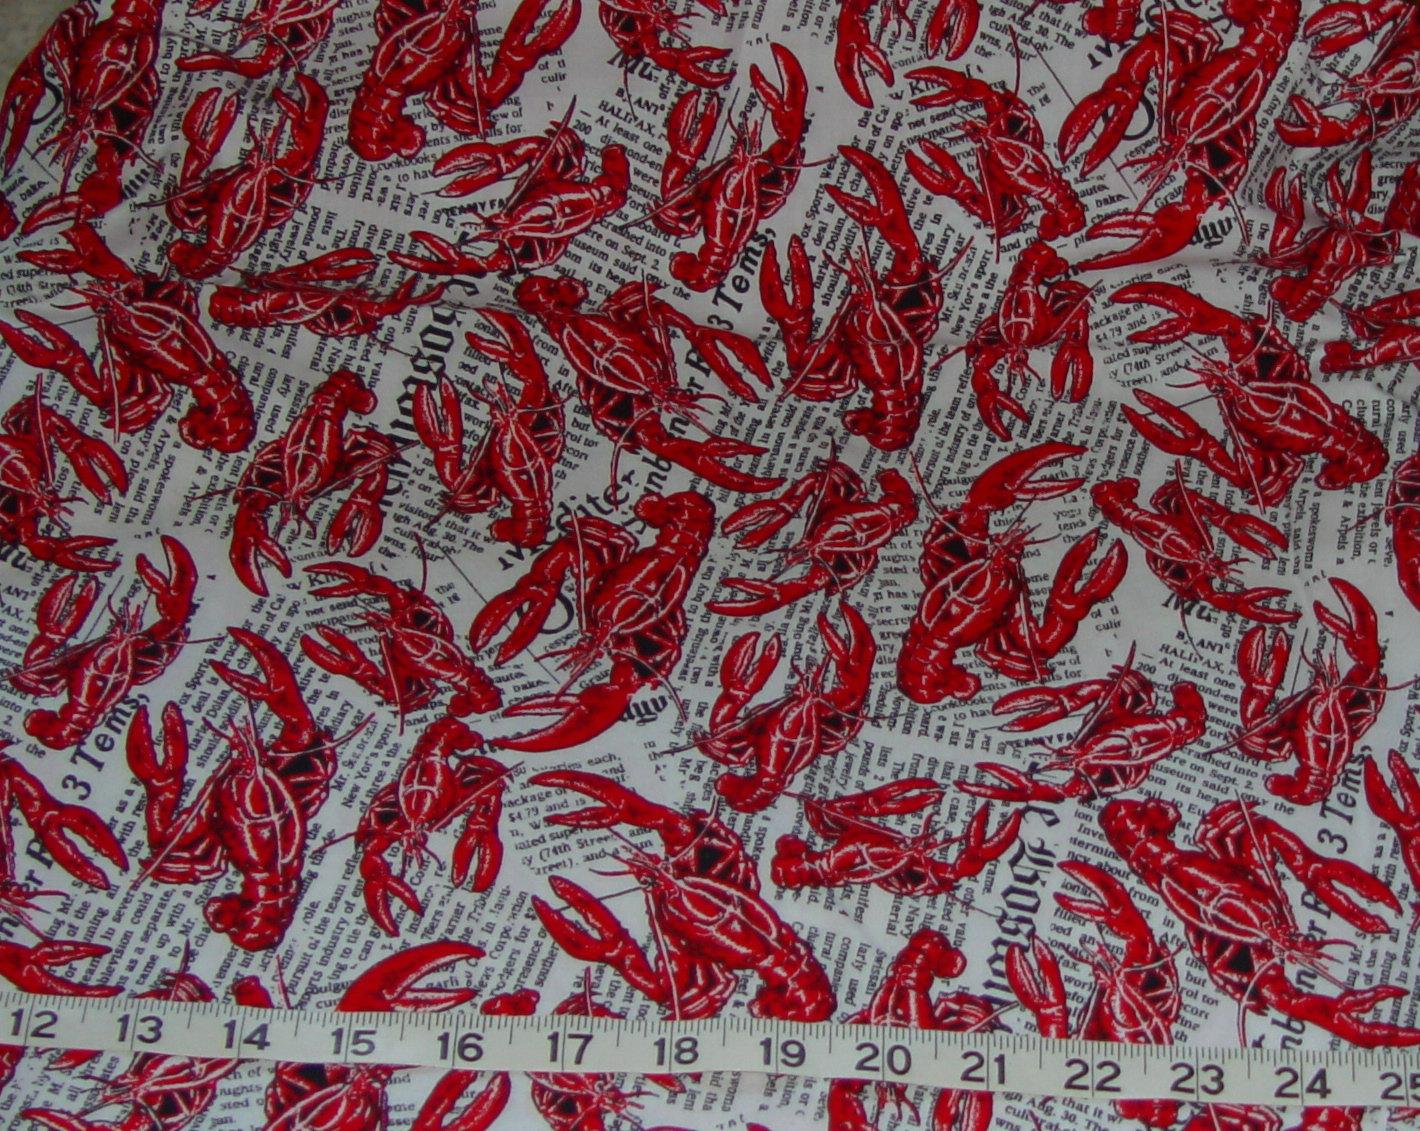 quilting fabric,fabric by yardhalf yard bunny vintage pattern cotton fabric Cotton bunny vintage print fabric